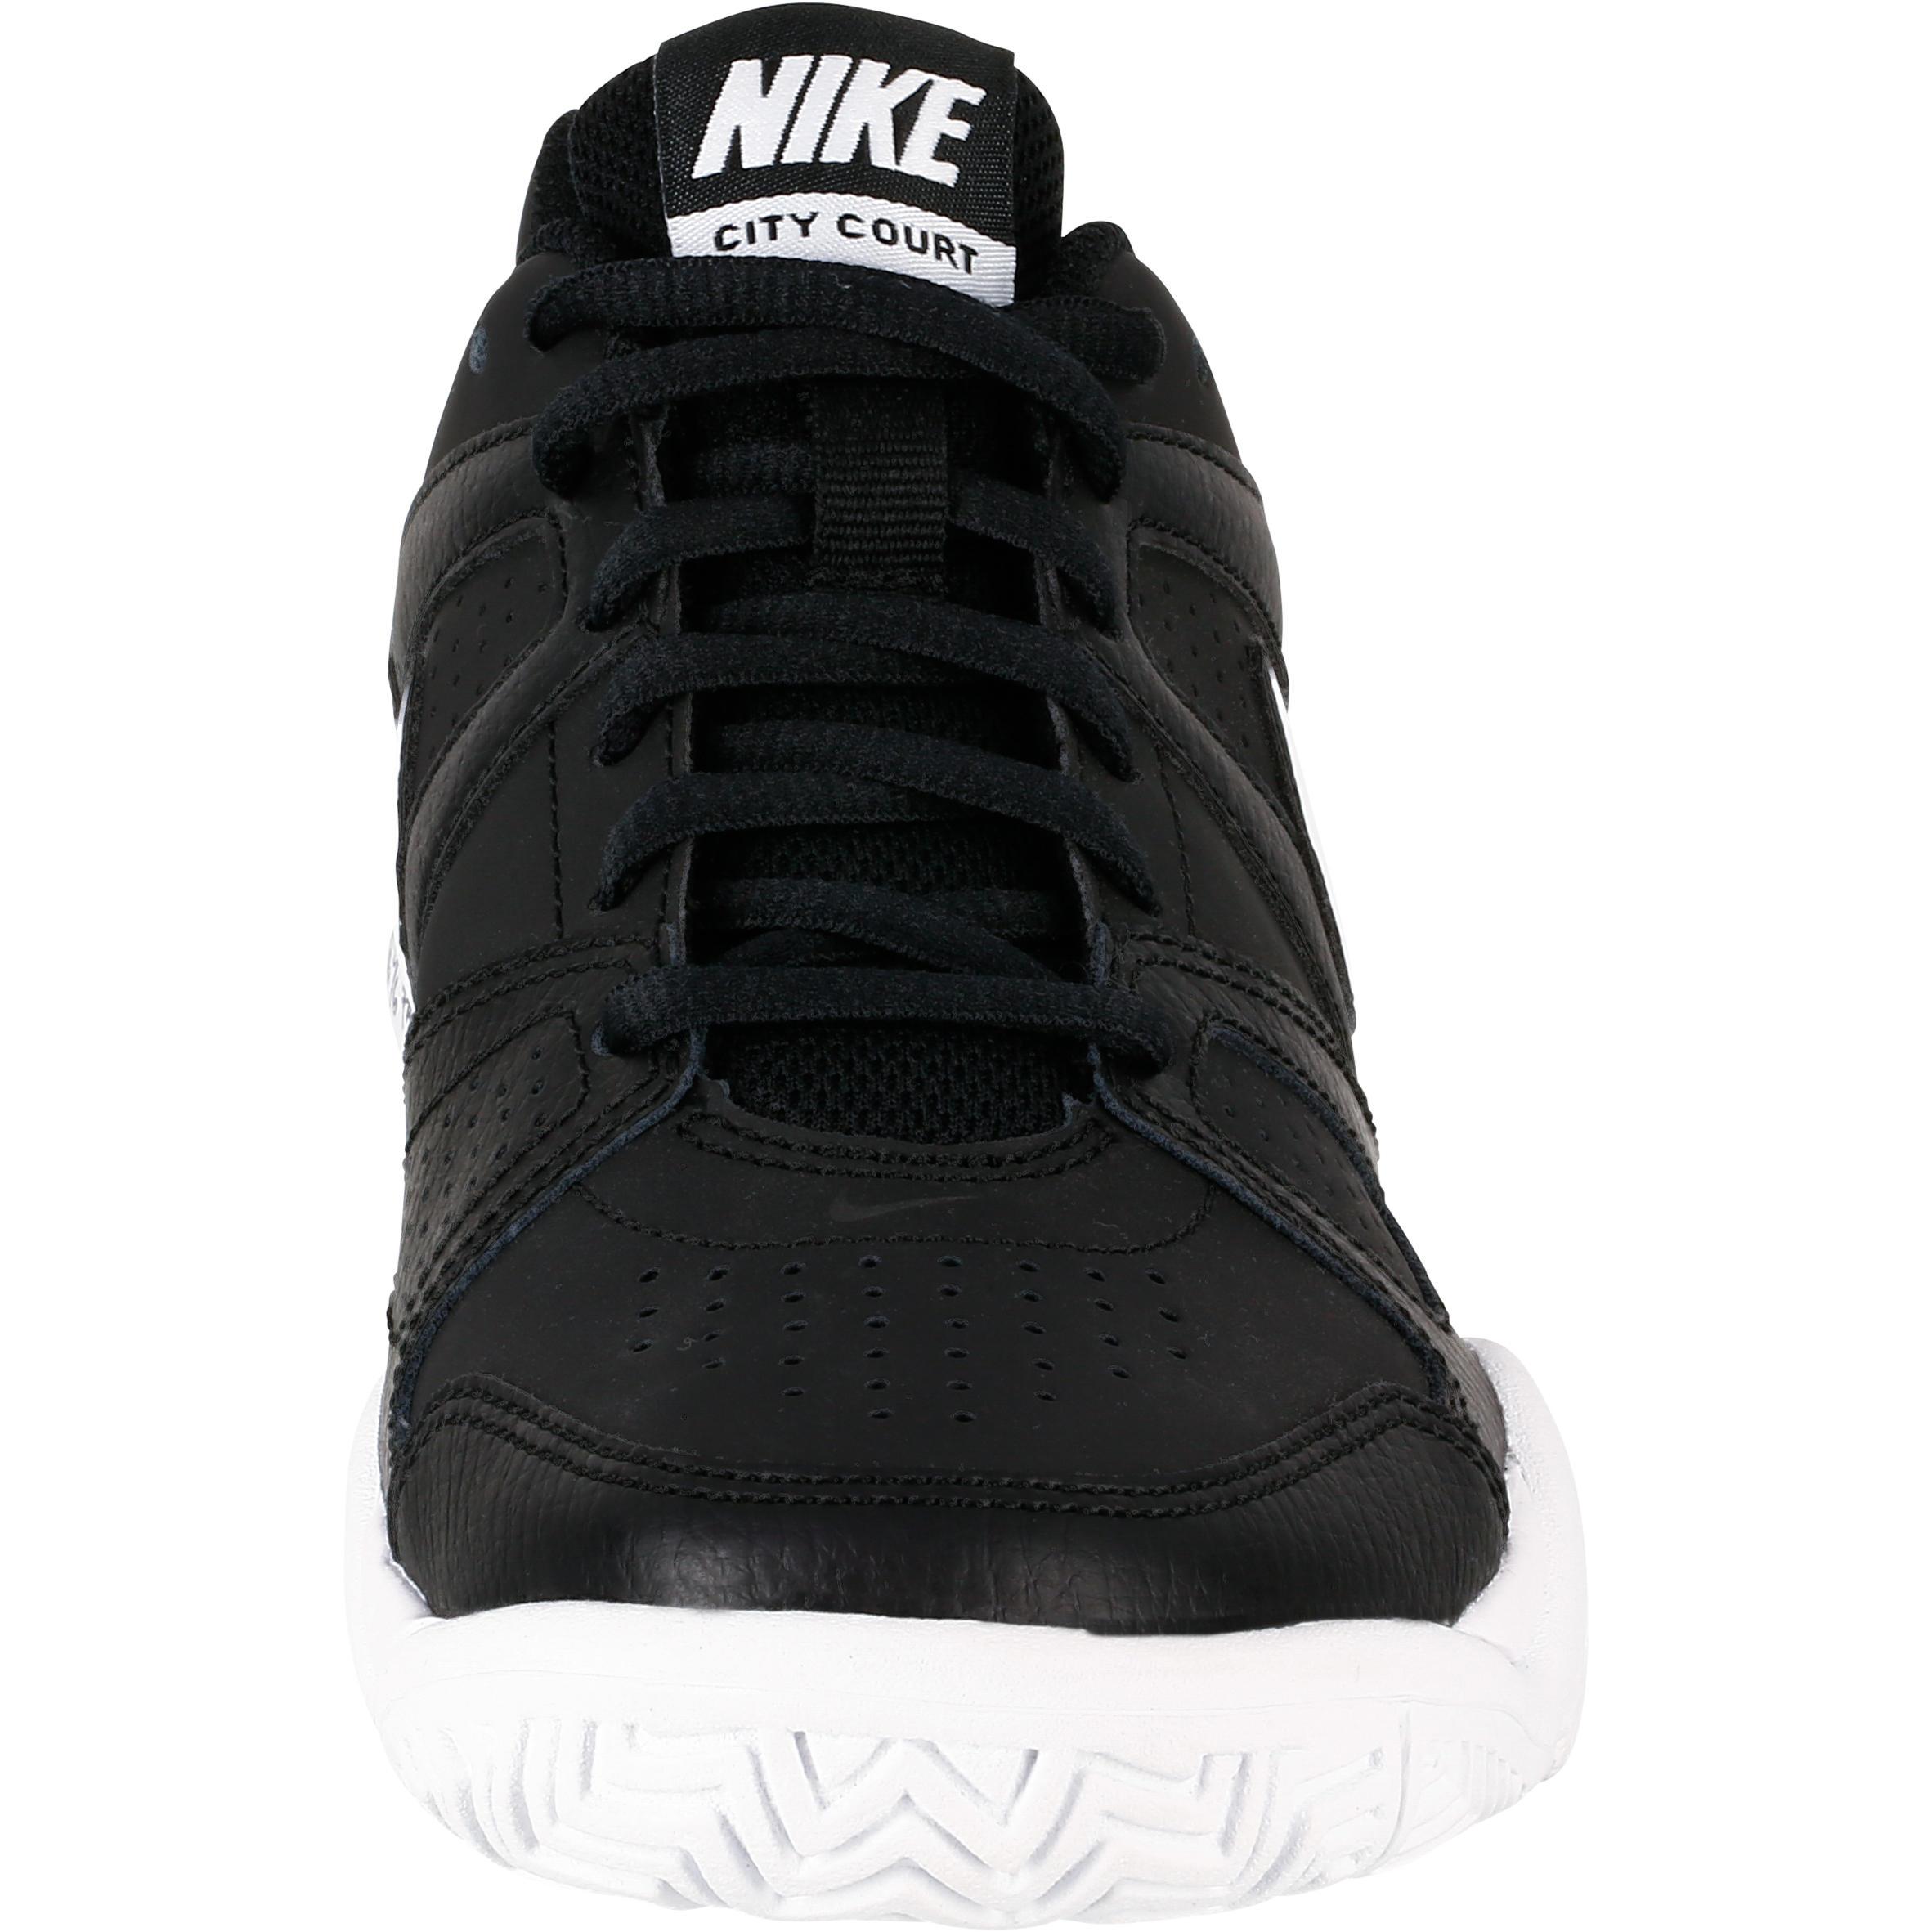 Chaussures Noir De Enfant City Thqxrdsc Nike Tennis Court yYbg76f